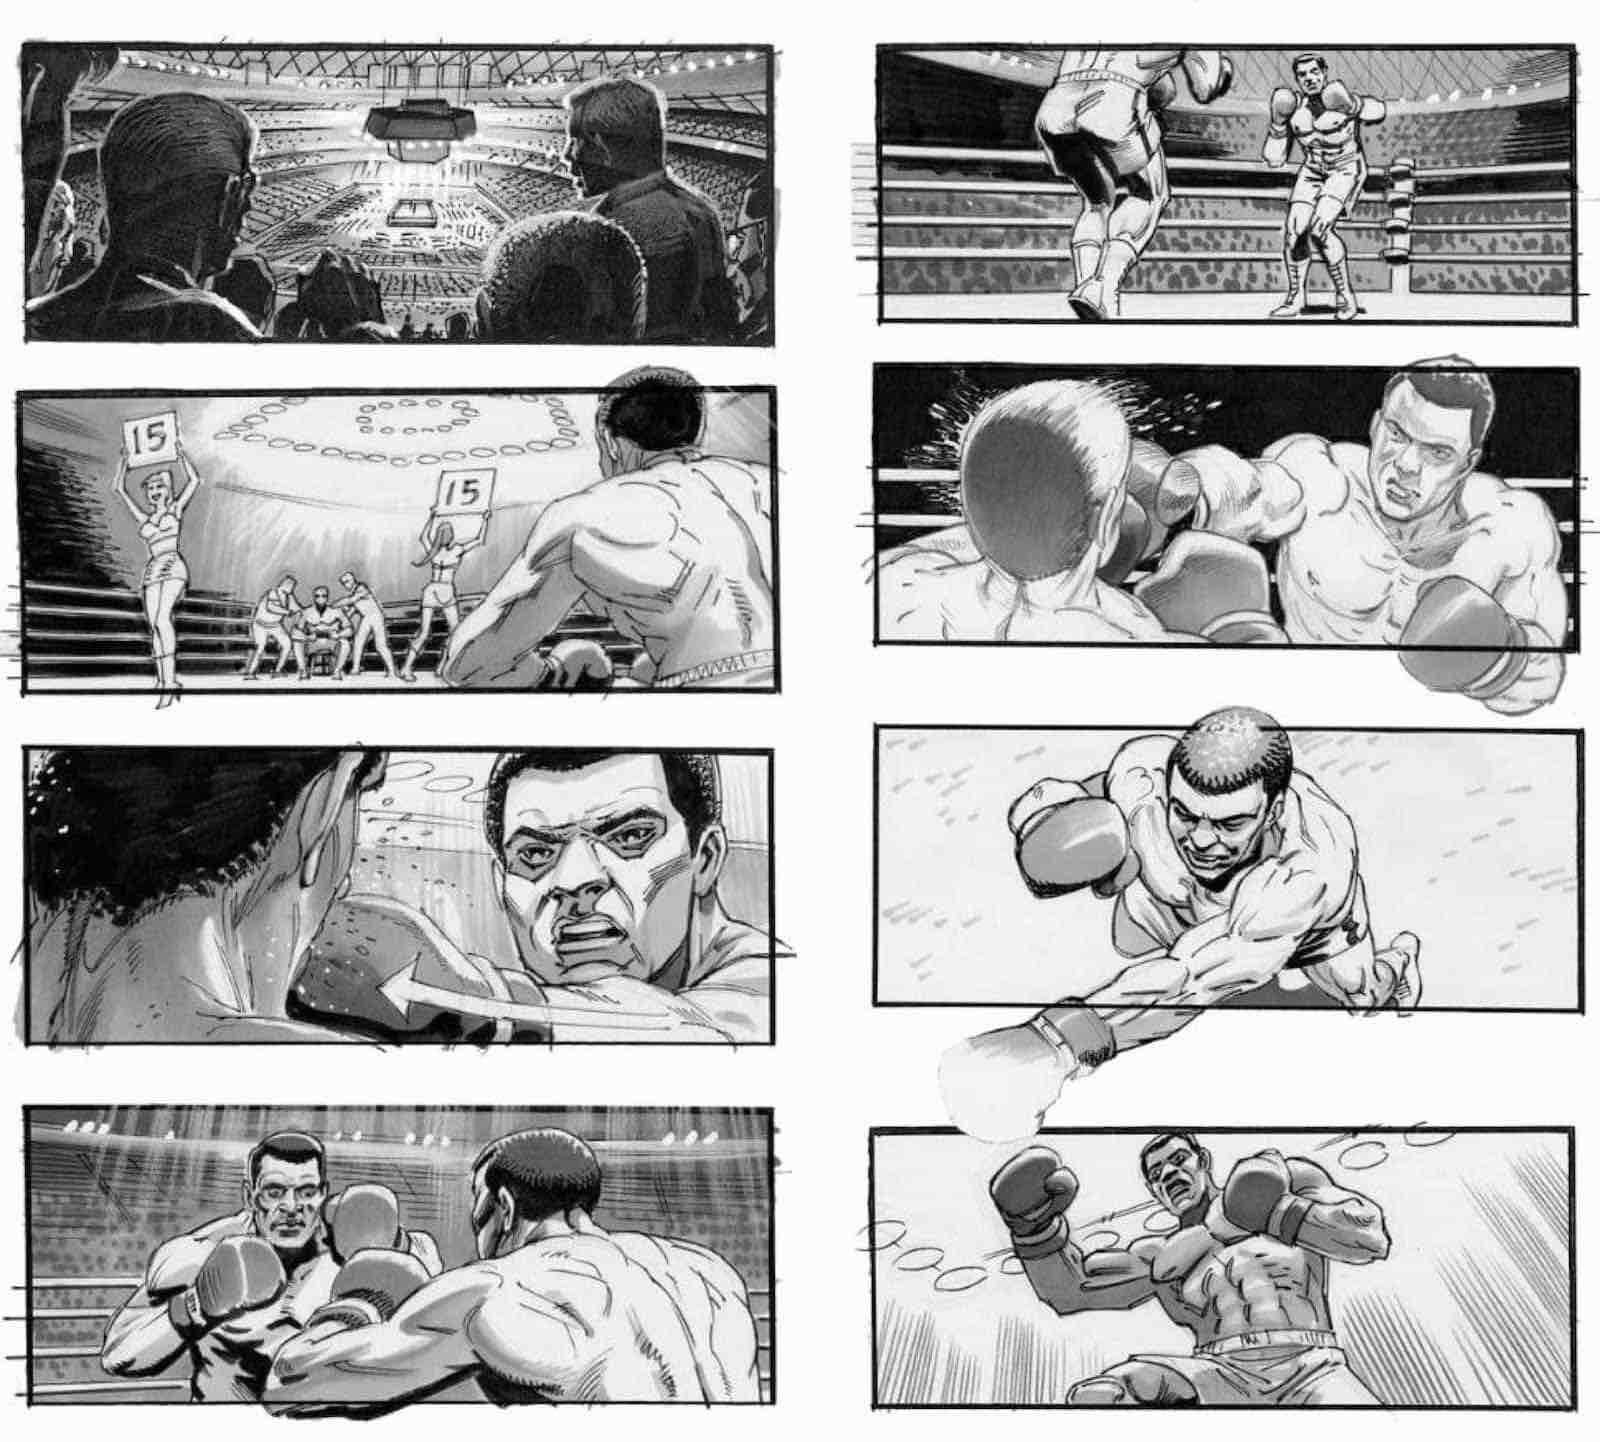 Storyboard Examples for Film - Storyboard Ideas - Tim Burgard - Michael Mann - Ali - StudioBinder